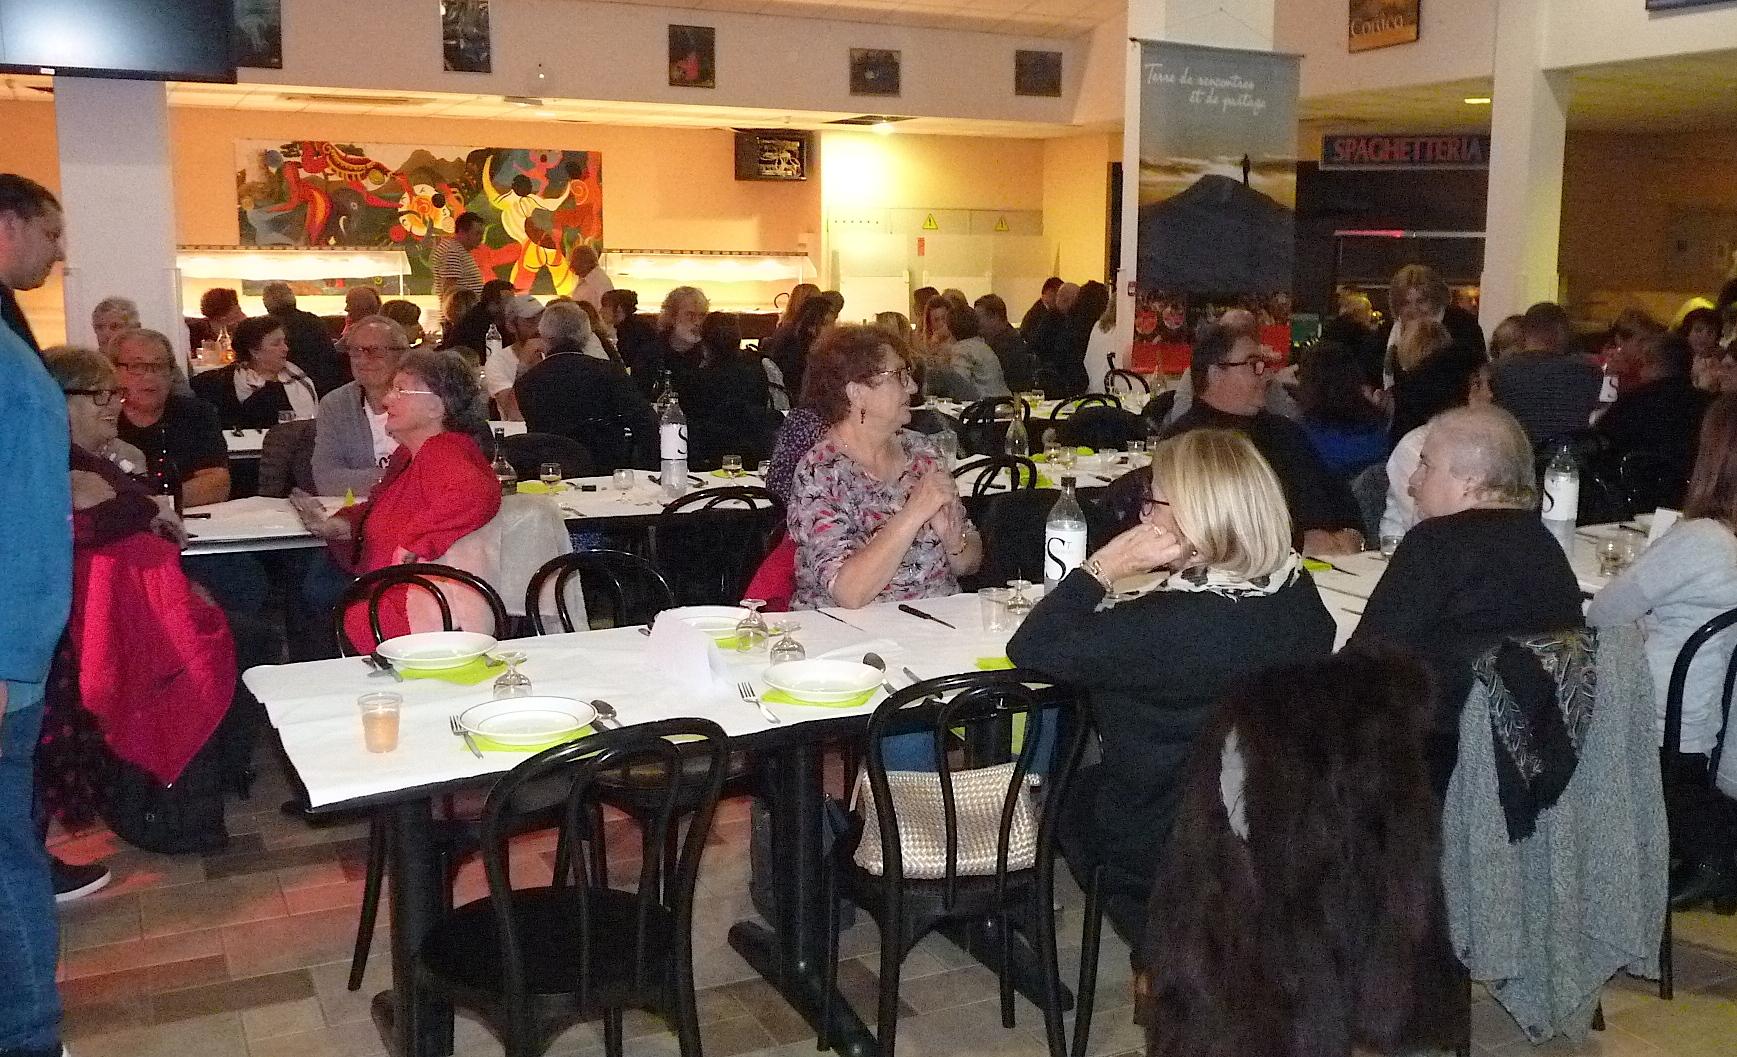 Soirée de Gala à Porticcio : « Pescadori in Festa » remercie ses partenaires